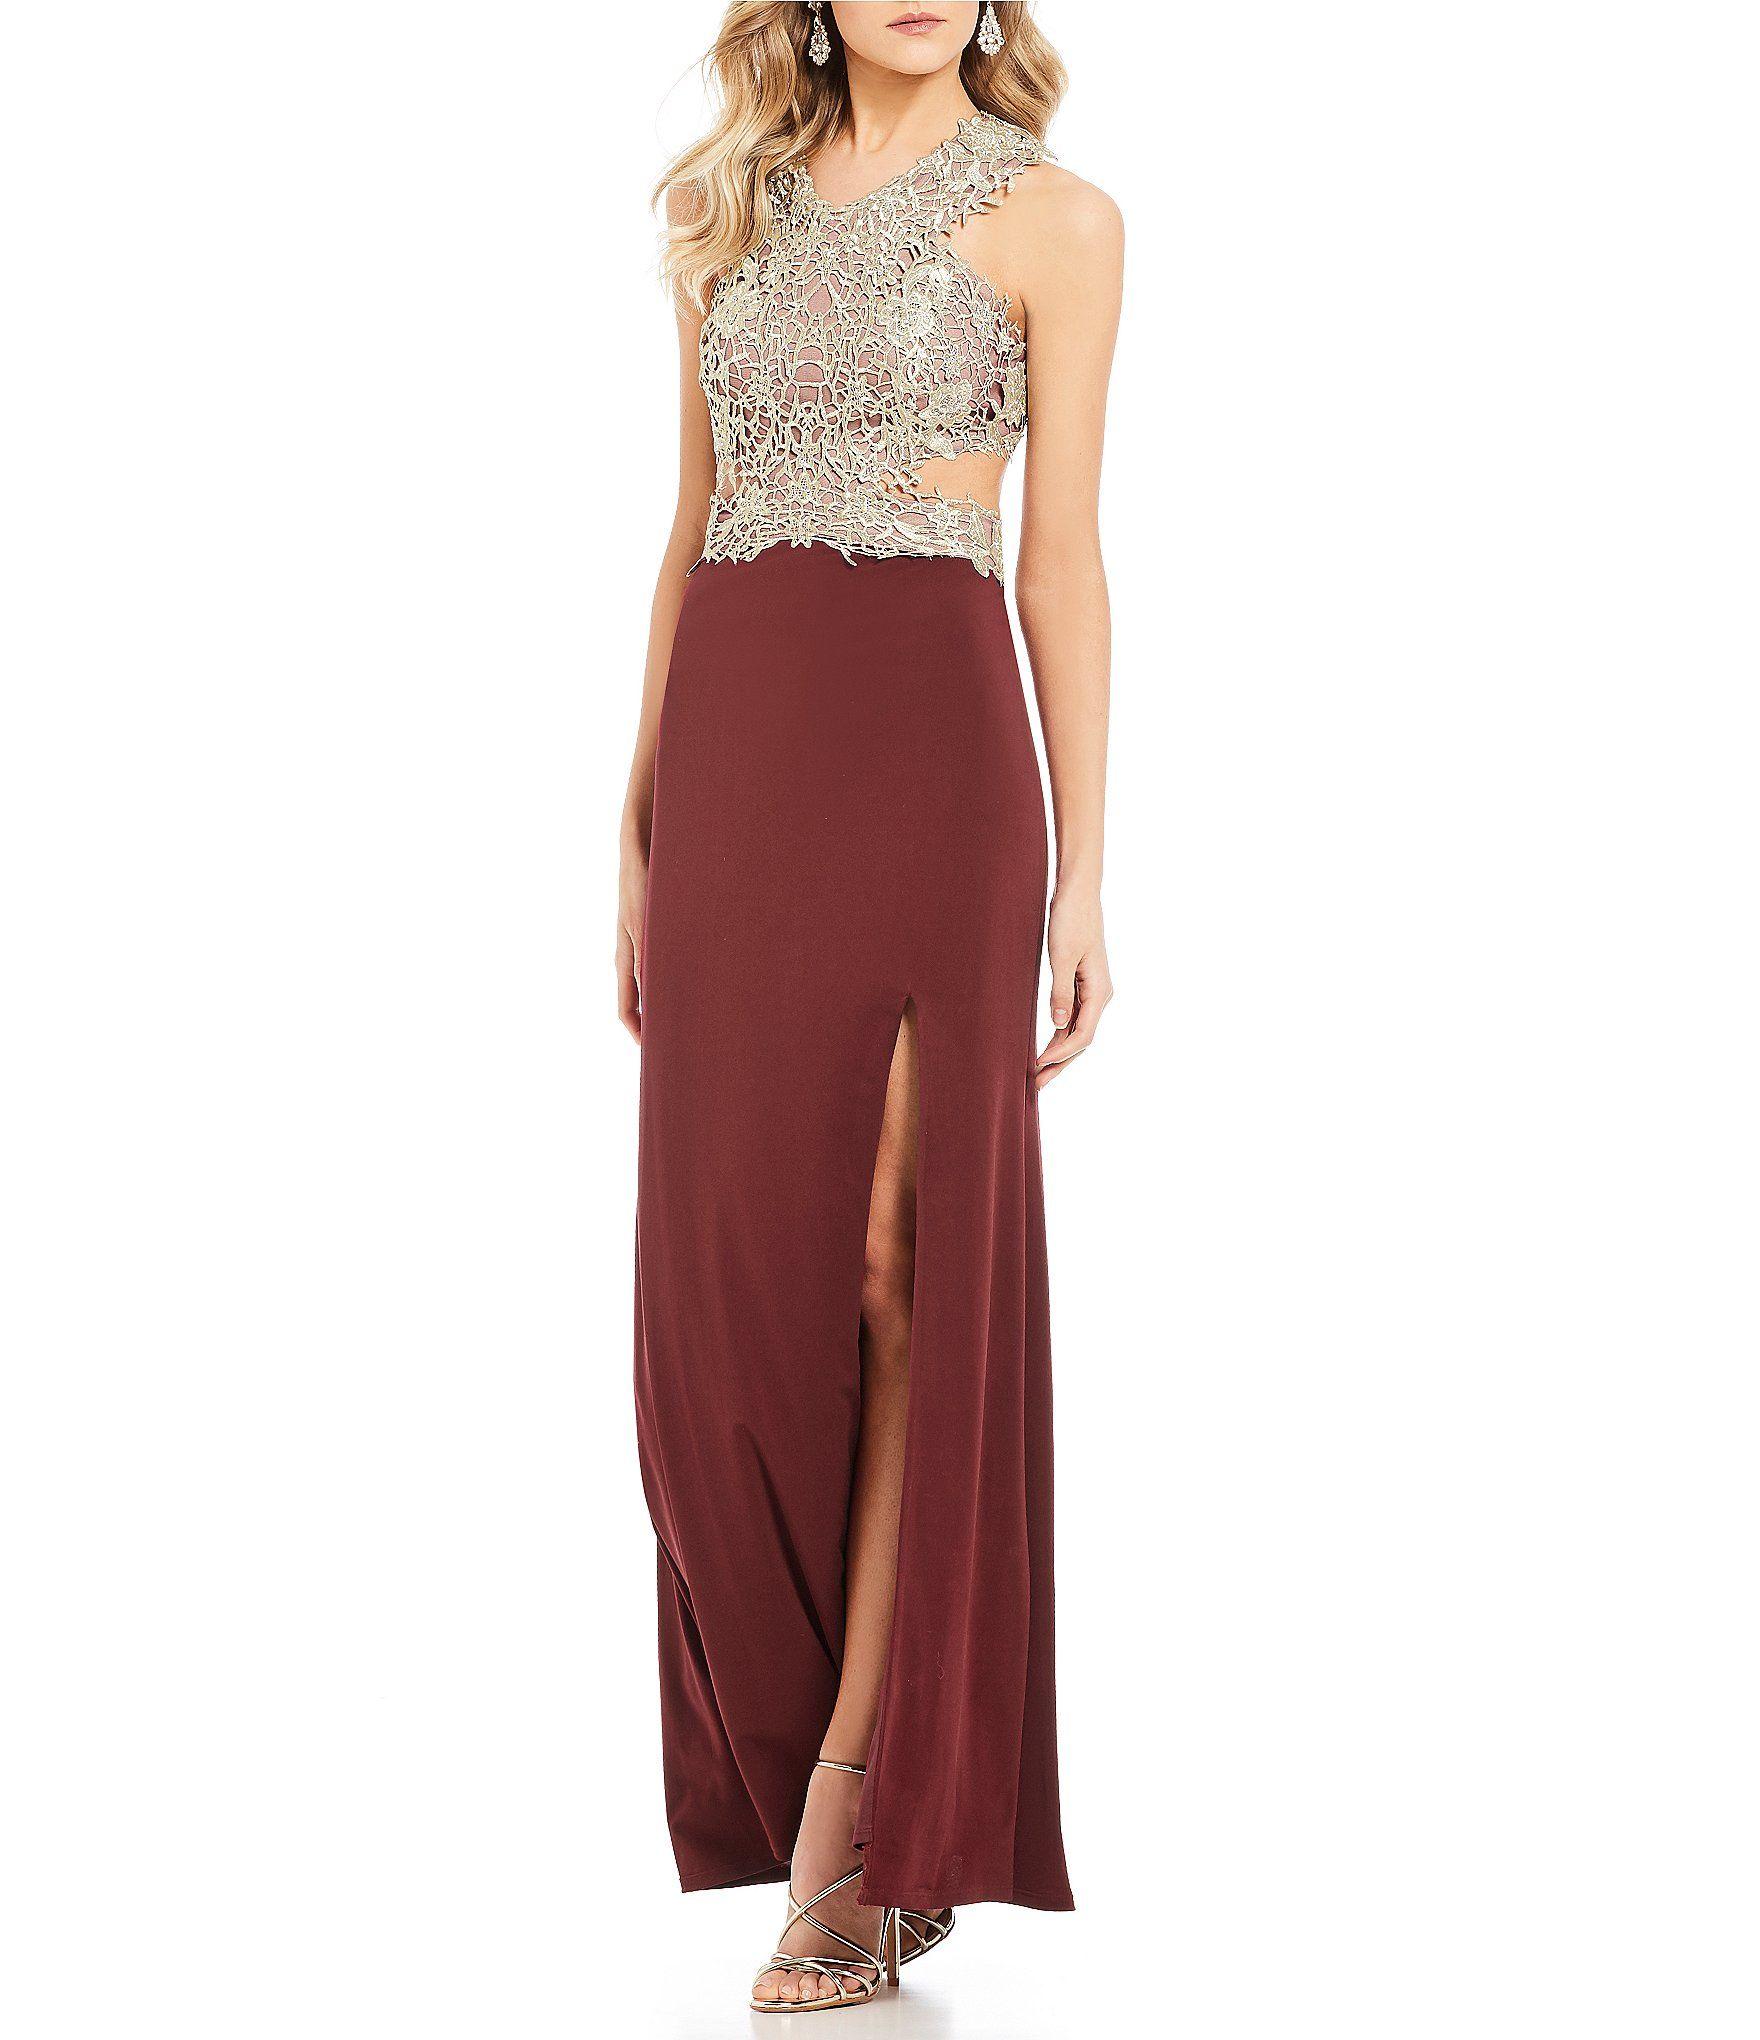 5d43464f41 Dillards Dresses Long Dresses - Gomes Weine AG